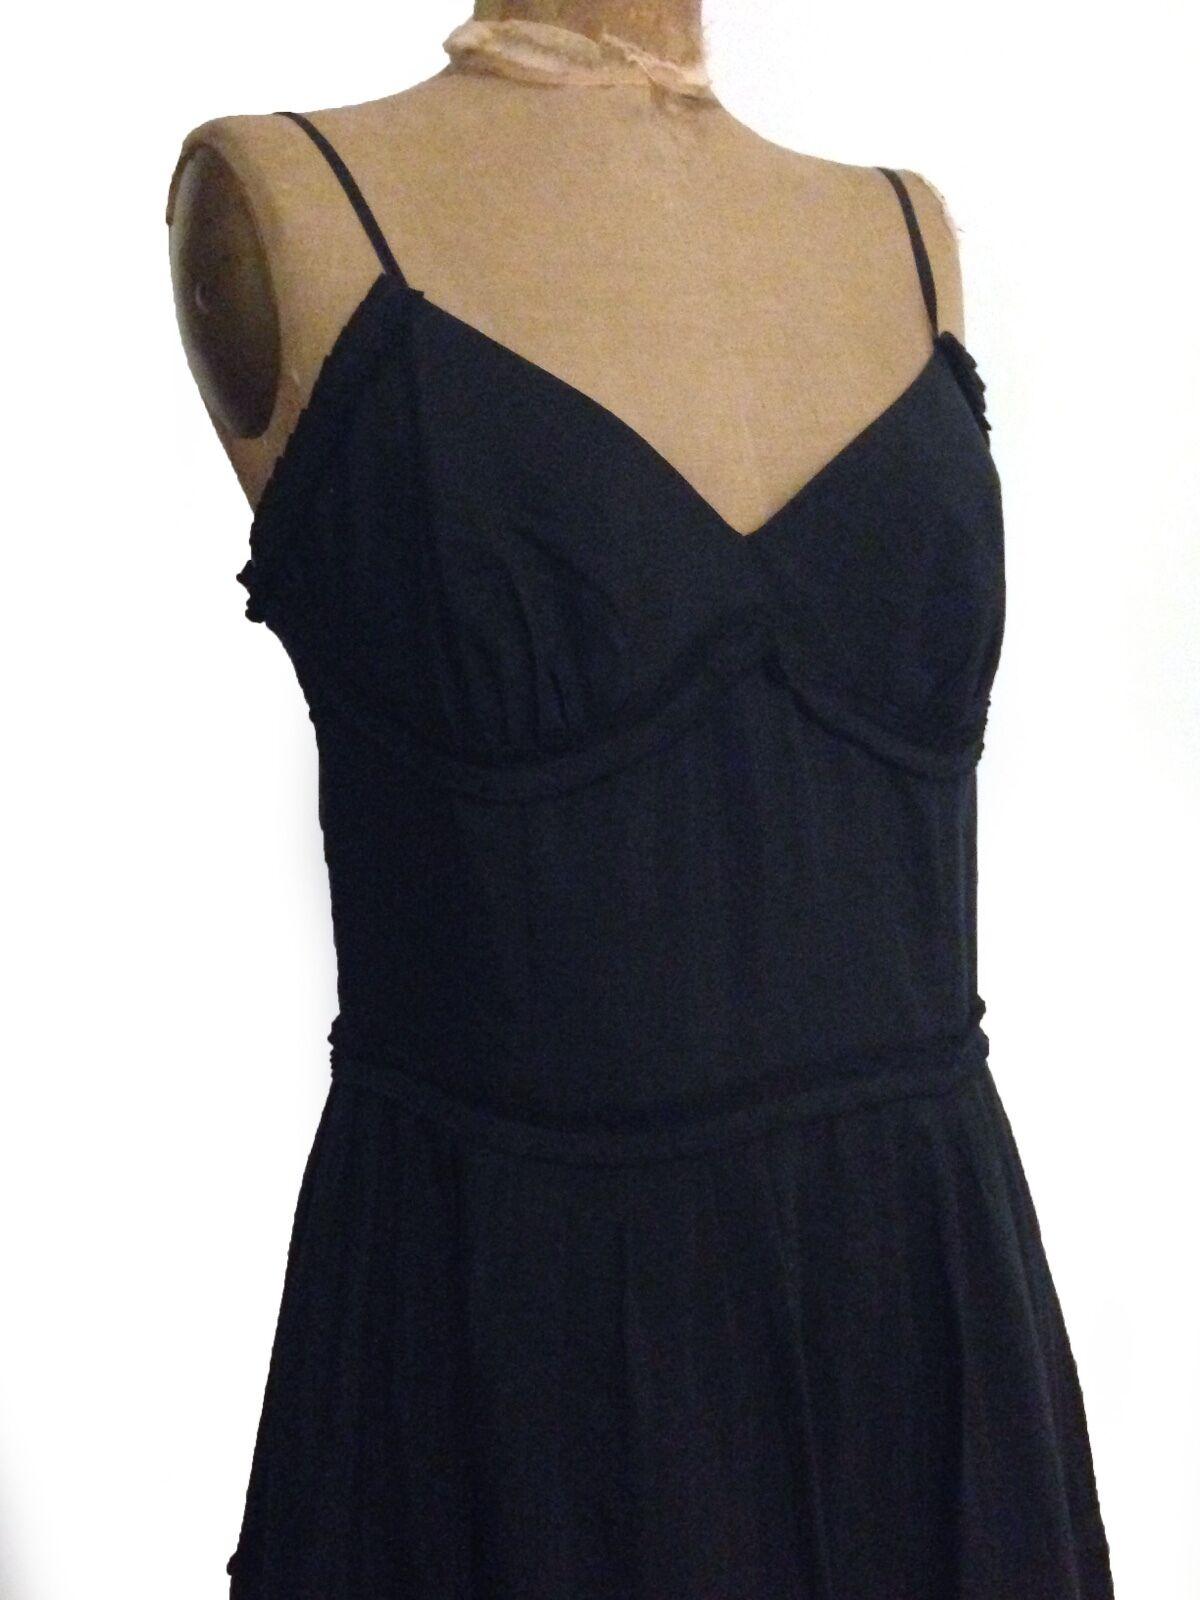 schwarz Cotton & Silk Boho Cocktail Summer Maxi Dress   By ANN TAYLOR  Sz 8